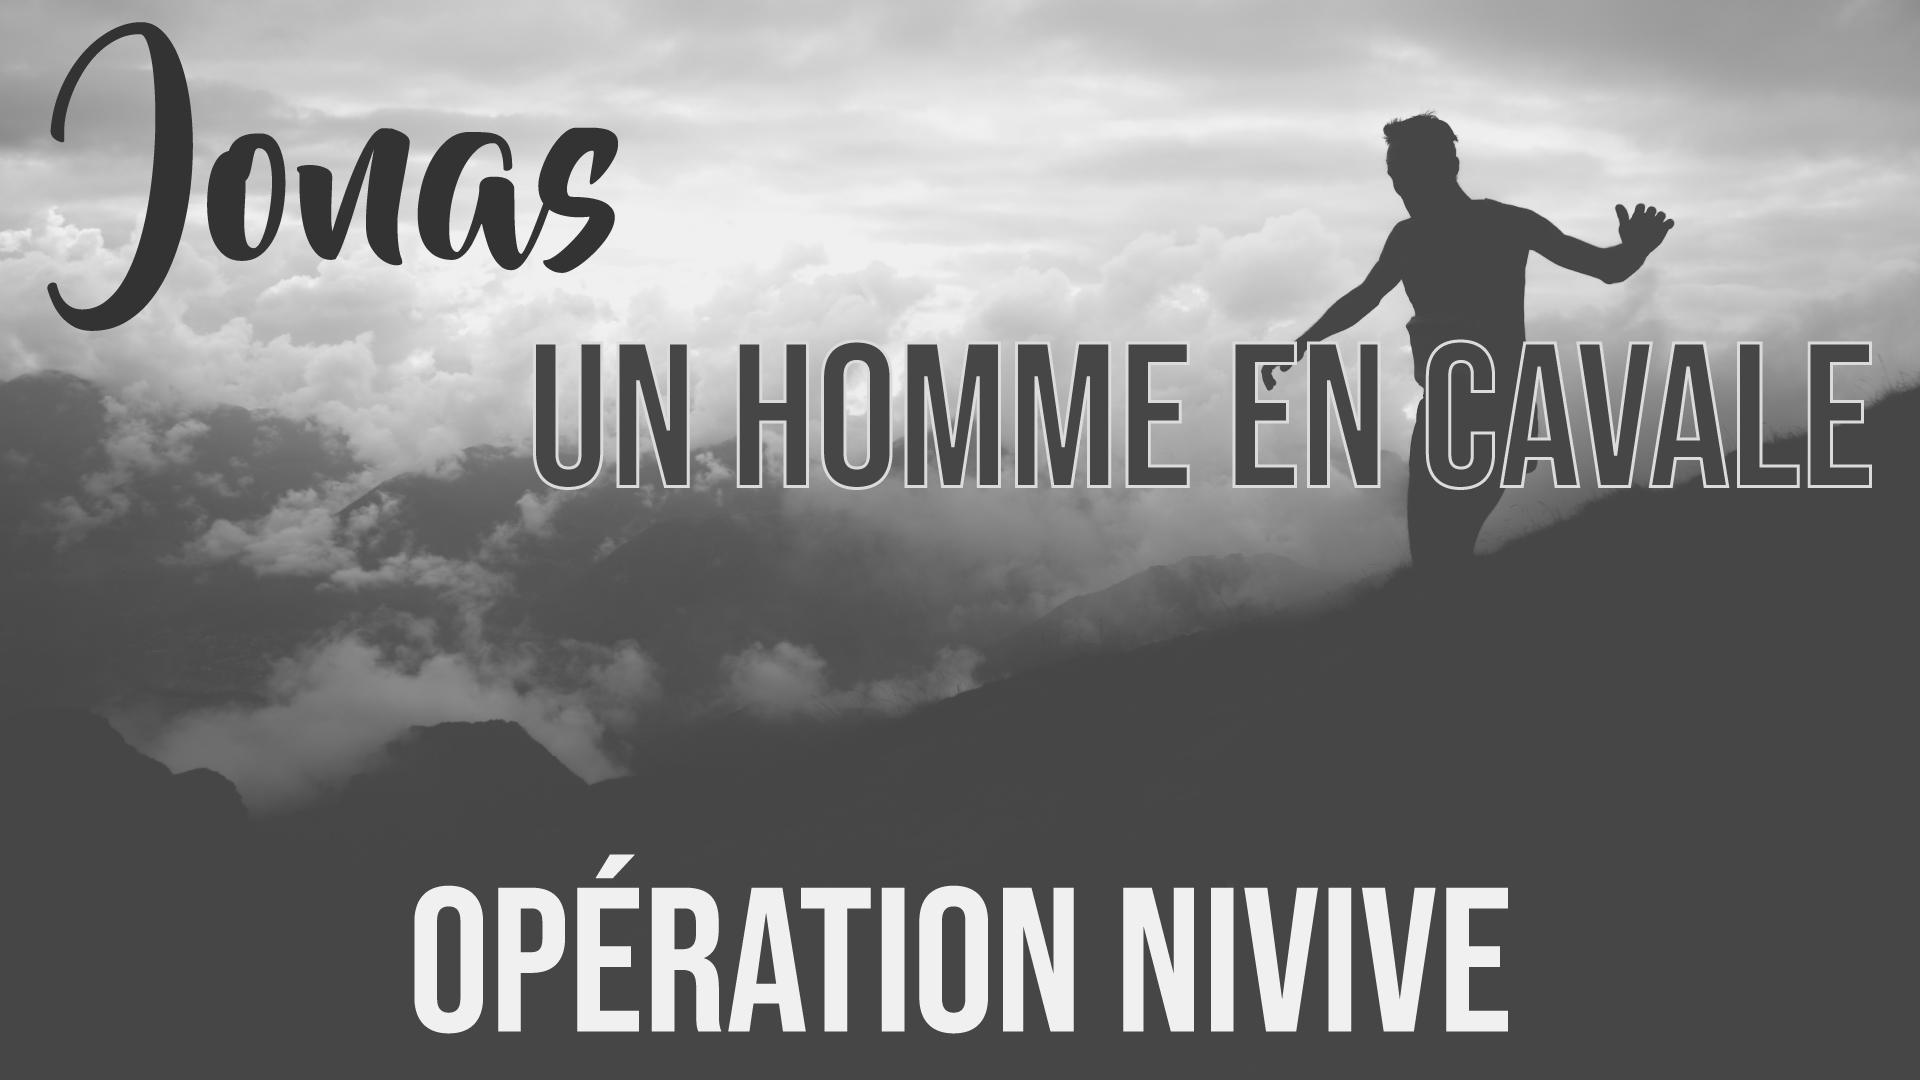 Jonas un homme en cavale - Opération Ninive